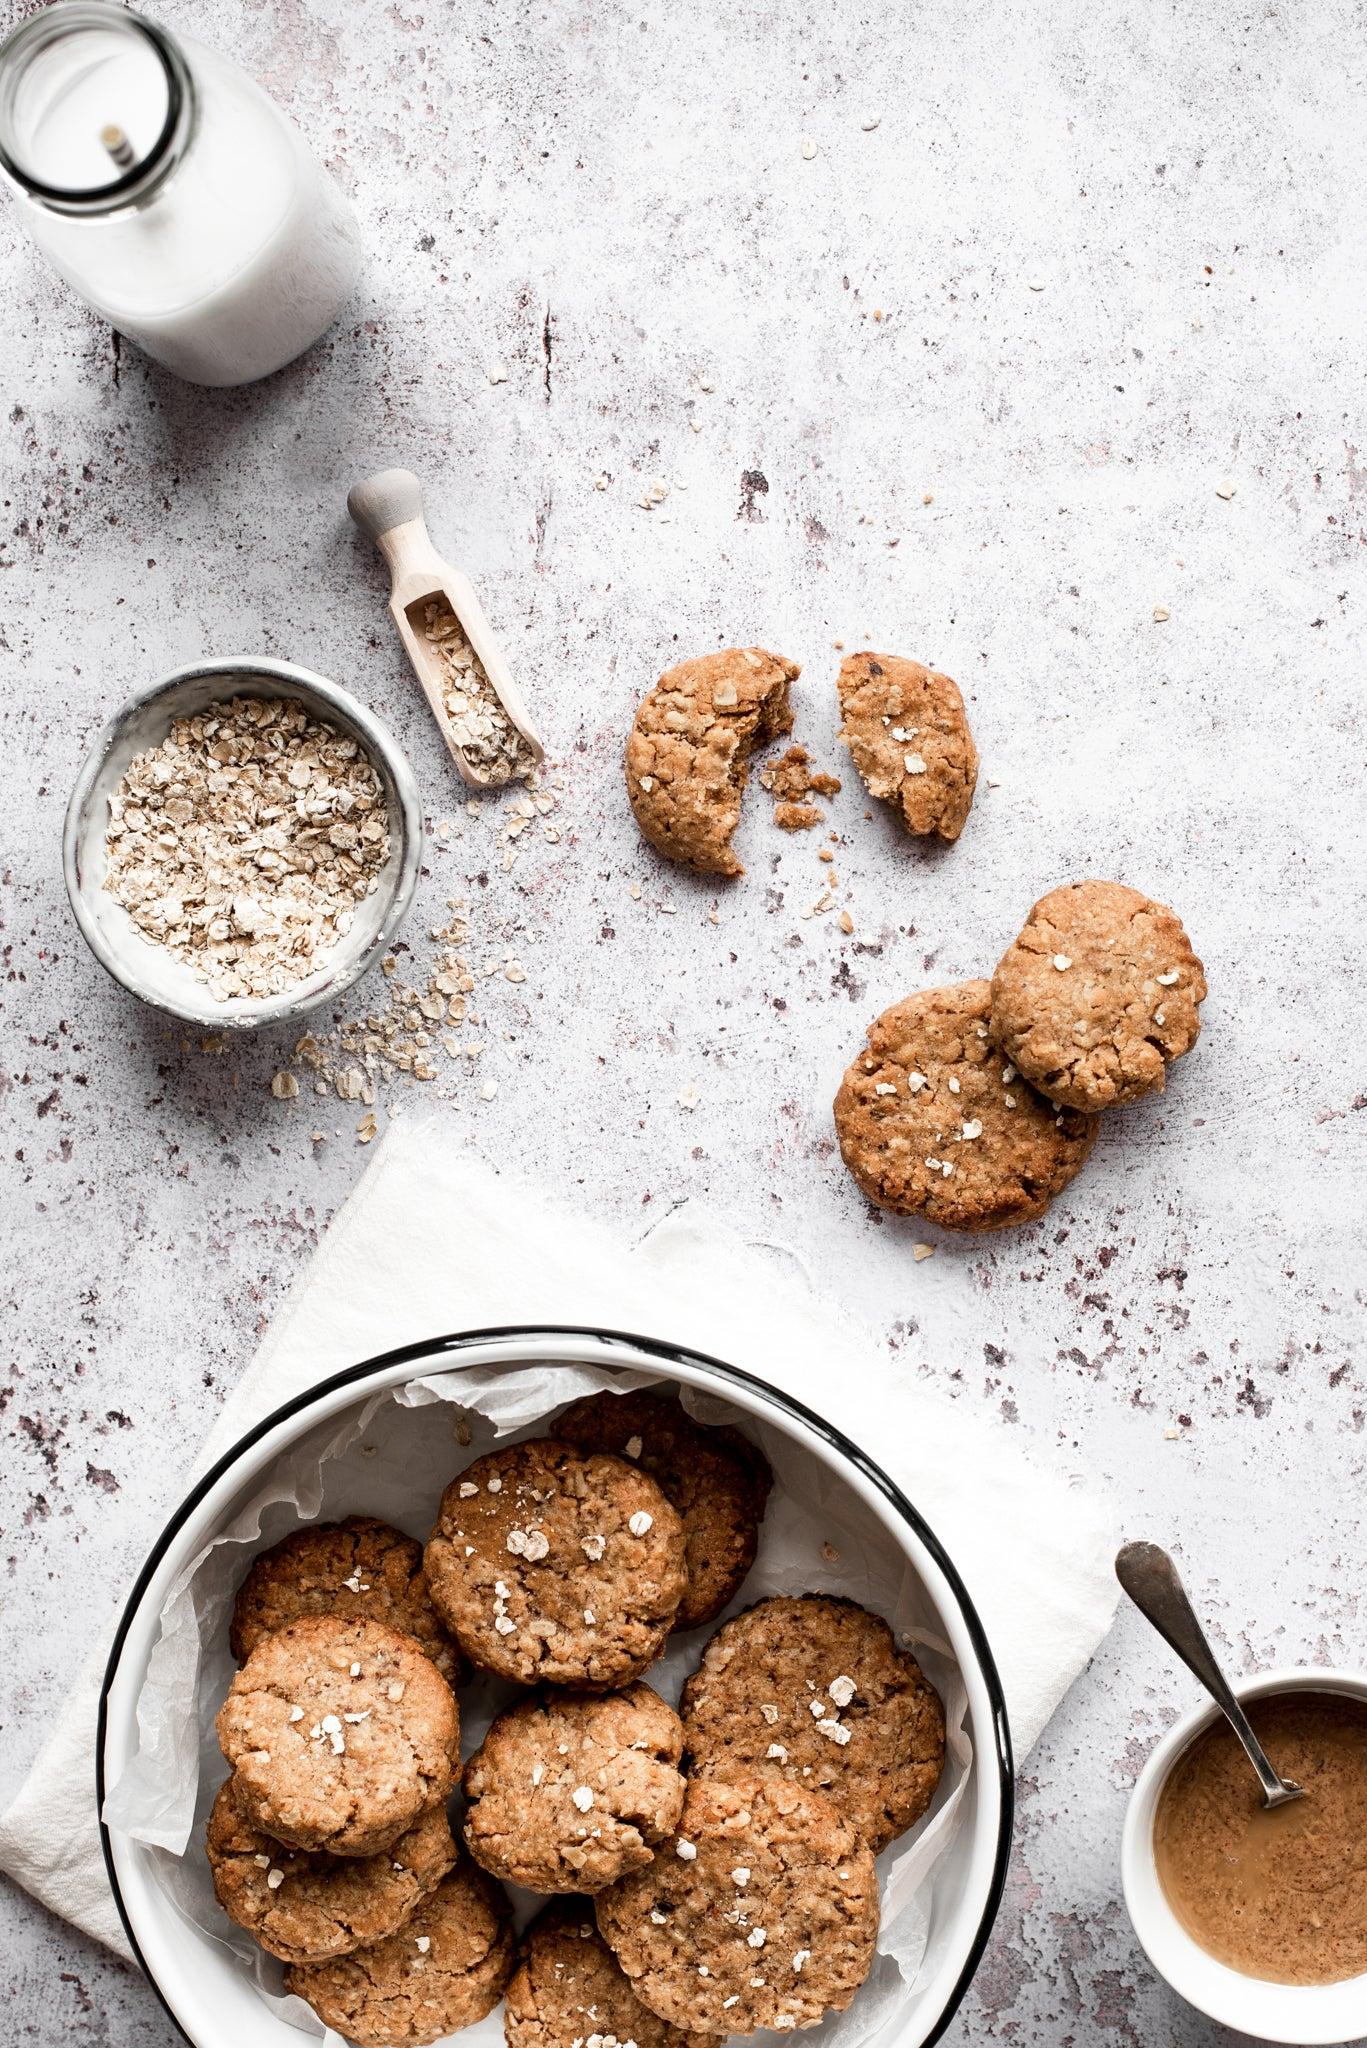 Gluten-Free-And-Vegan-Almond-Butter-Cookies-WEB-RES-5.jpg